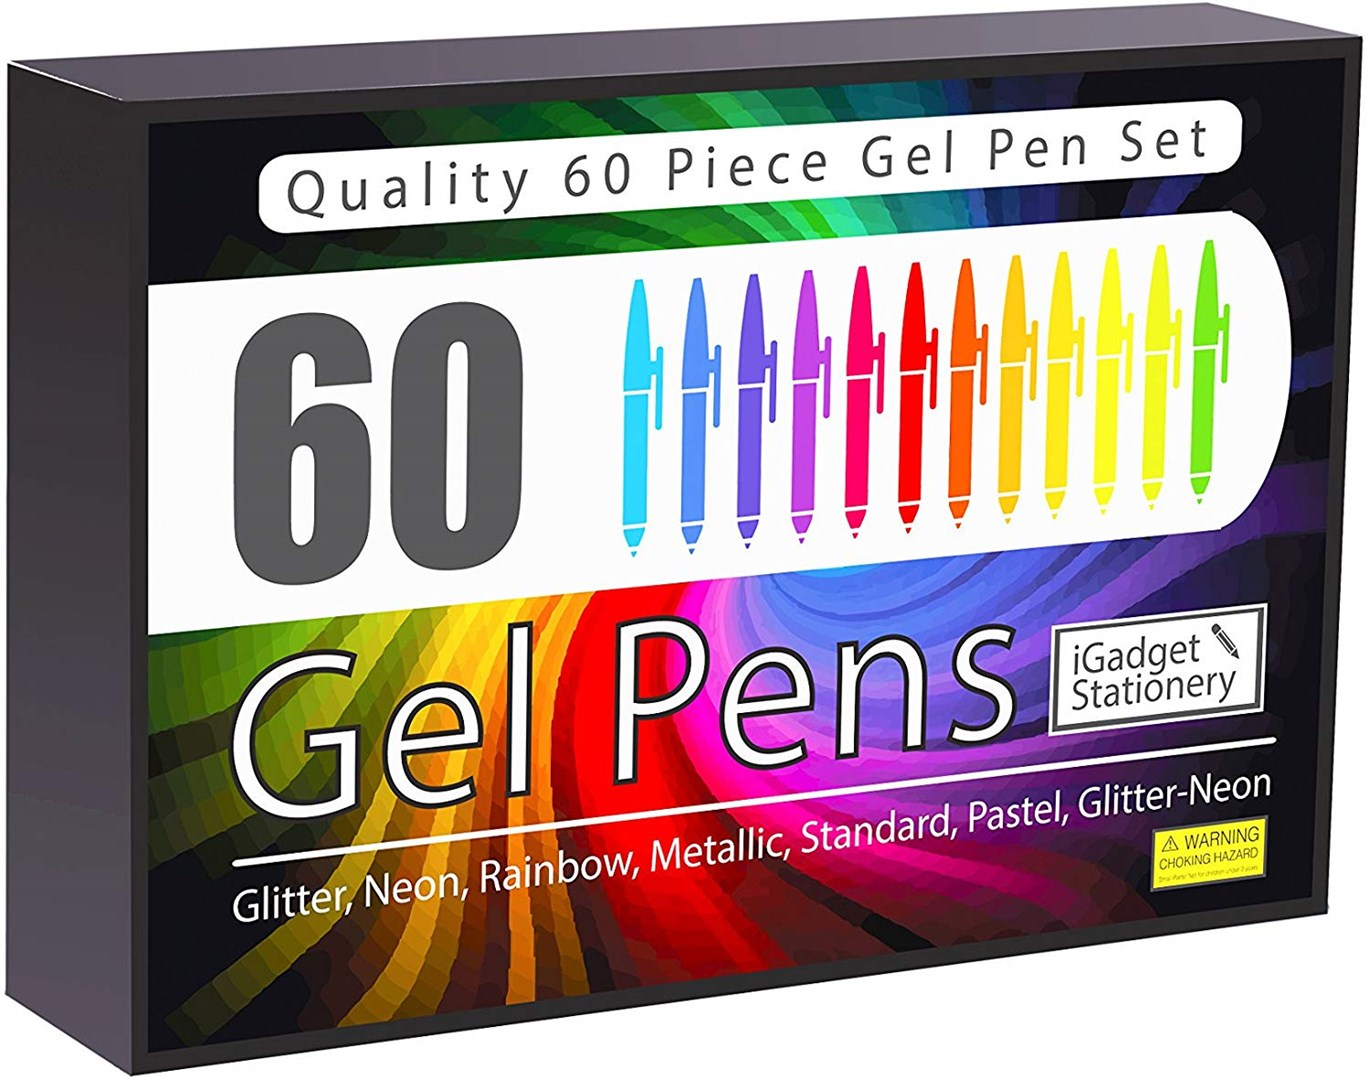 iGadget Innovations, sada gelových per, 60 ks